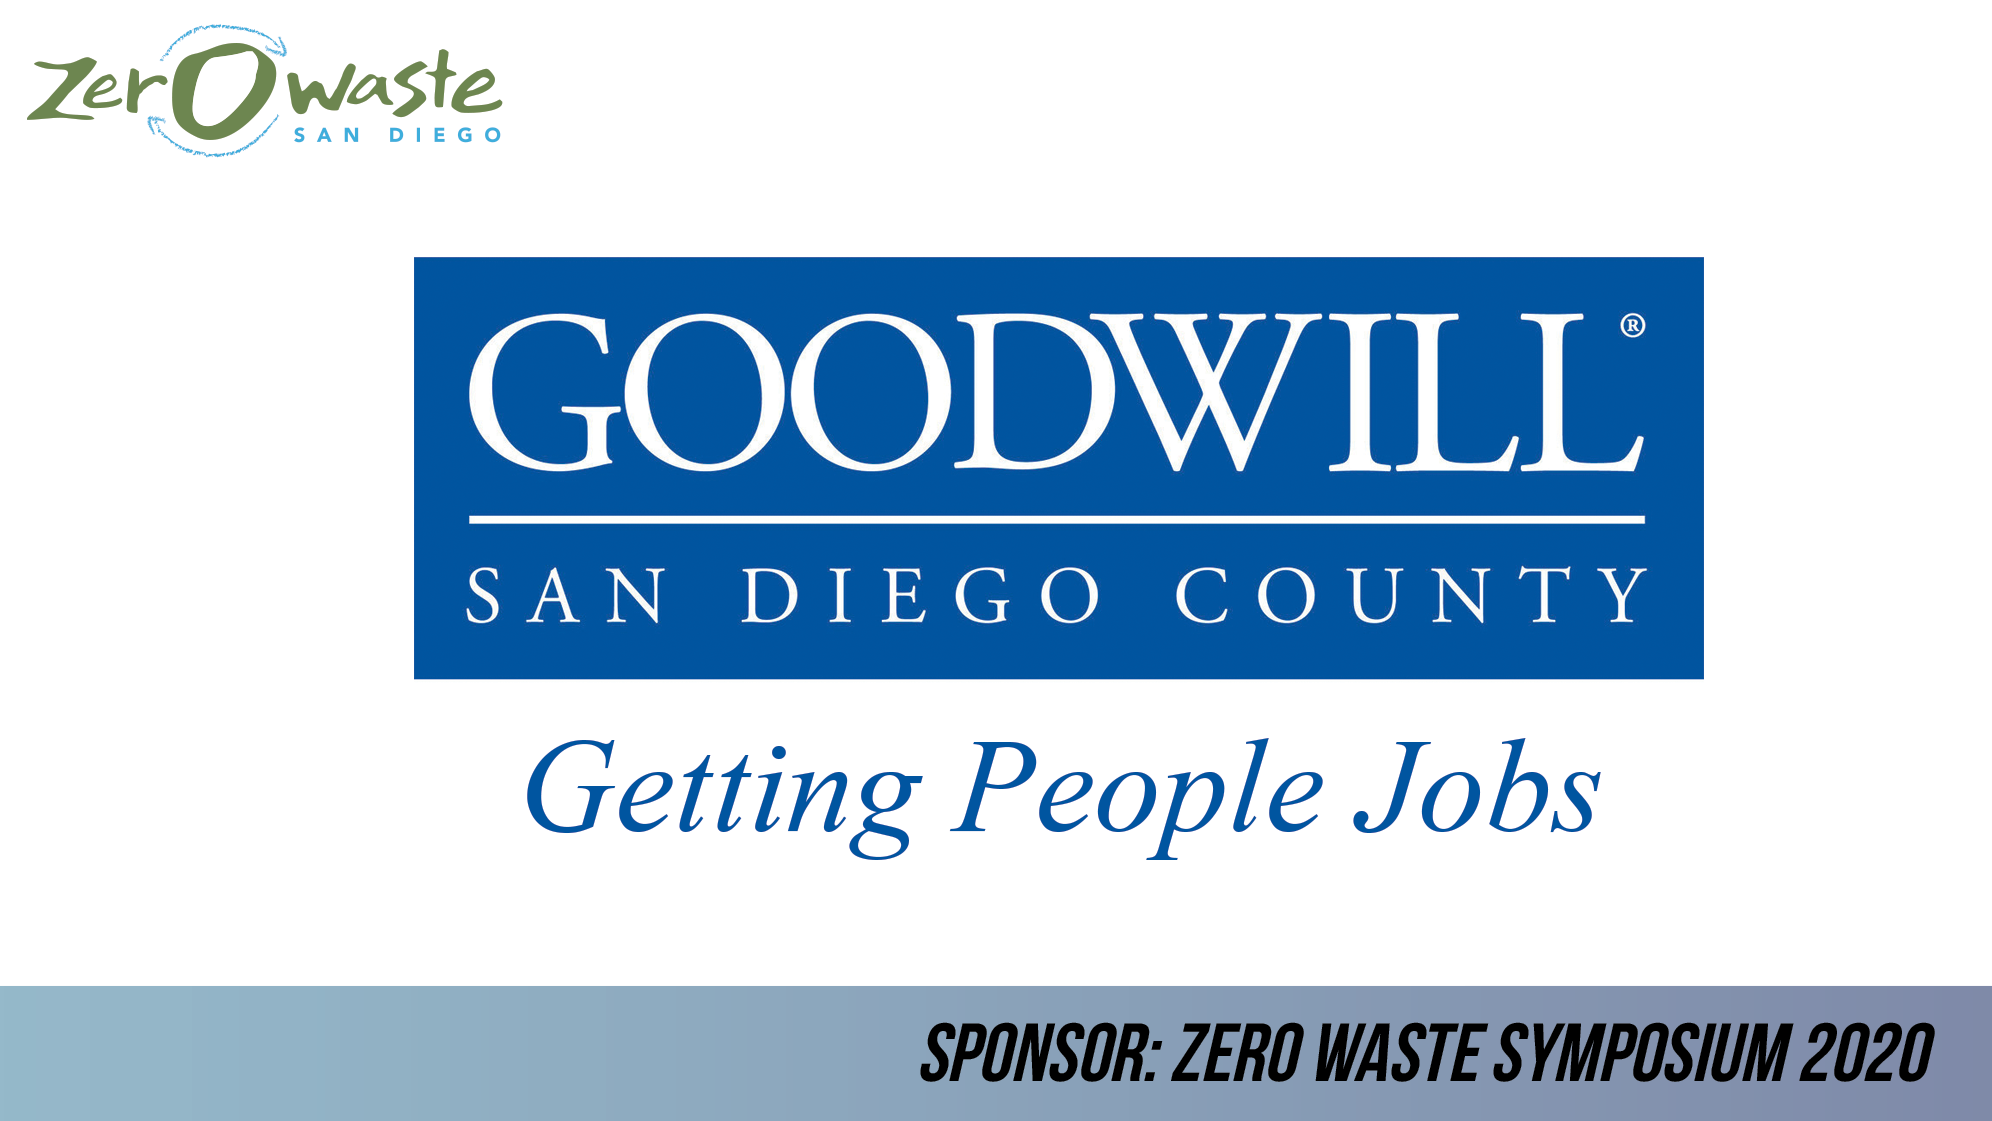 Goodwill San Diego